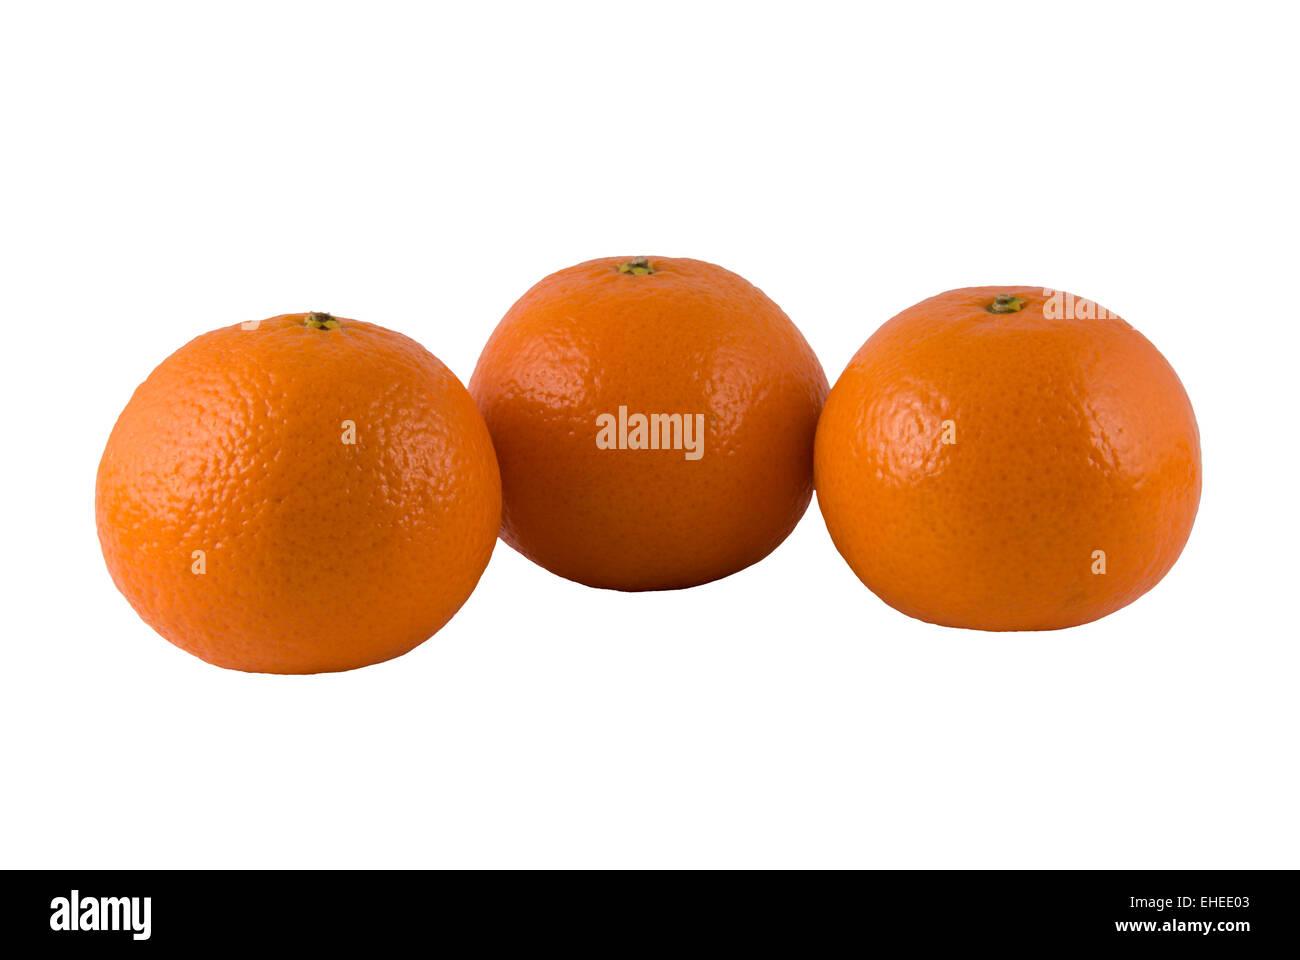 Three ripe oranges on a white background - Stock Image